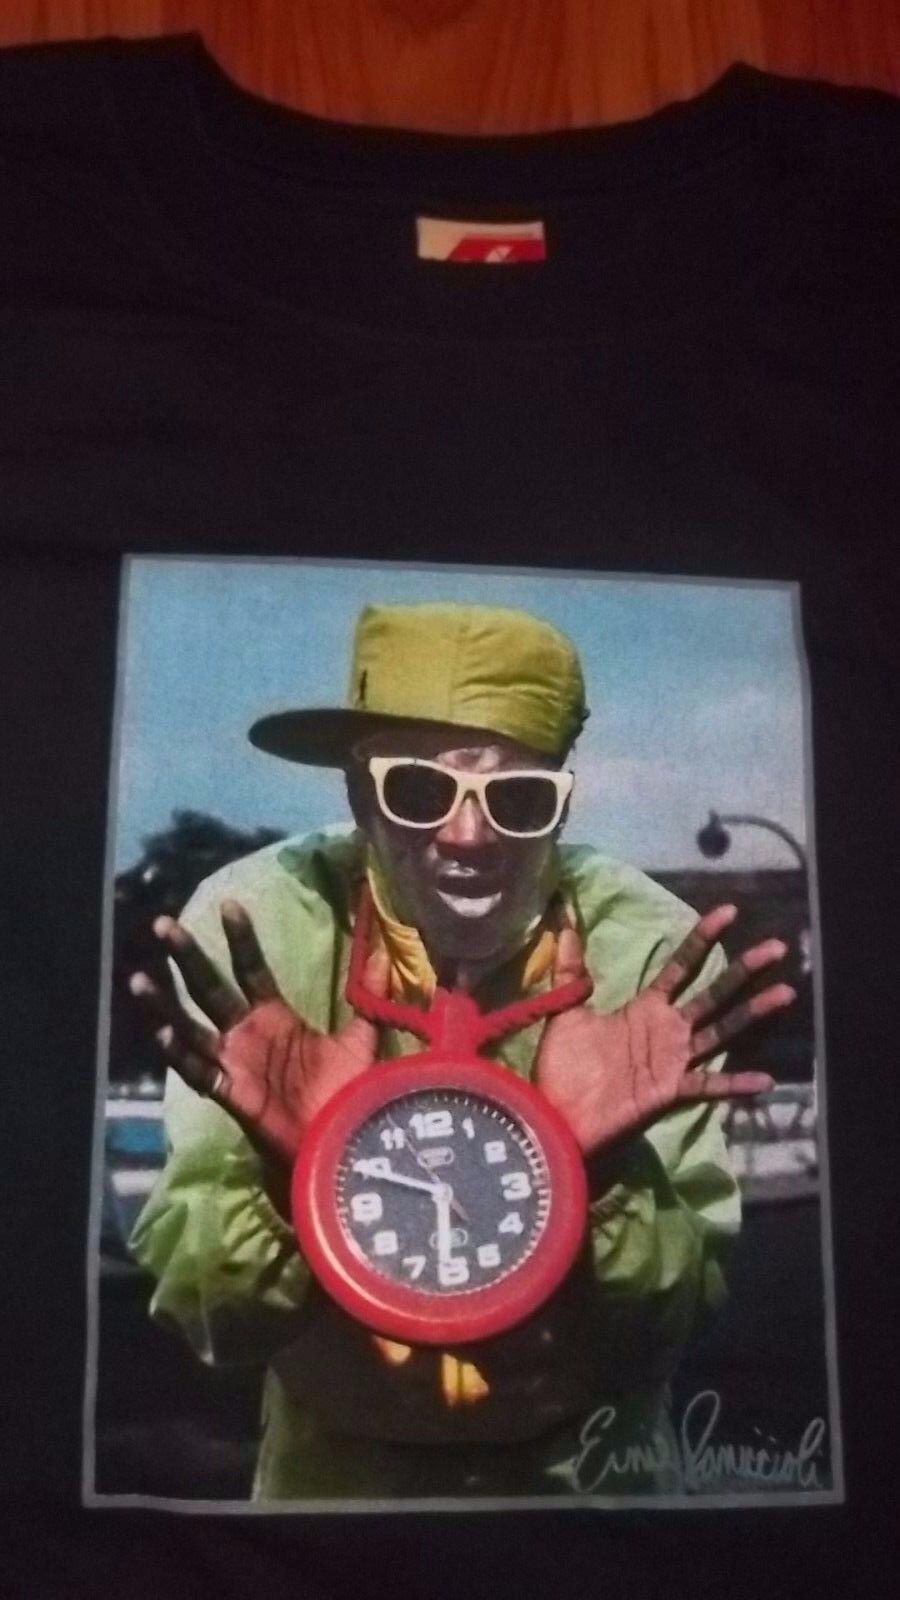 2XL Rap HIP HOP Photographer Ernie Paniccioli FLAVOR FLAV Shirt PUBLIC ENEMY